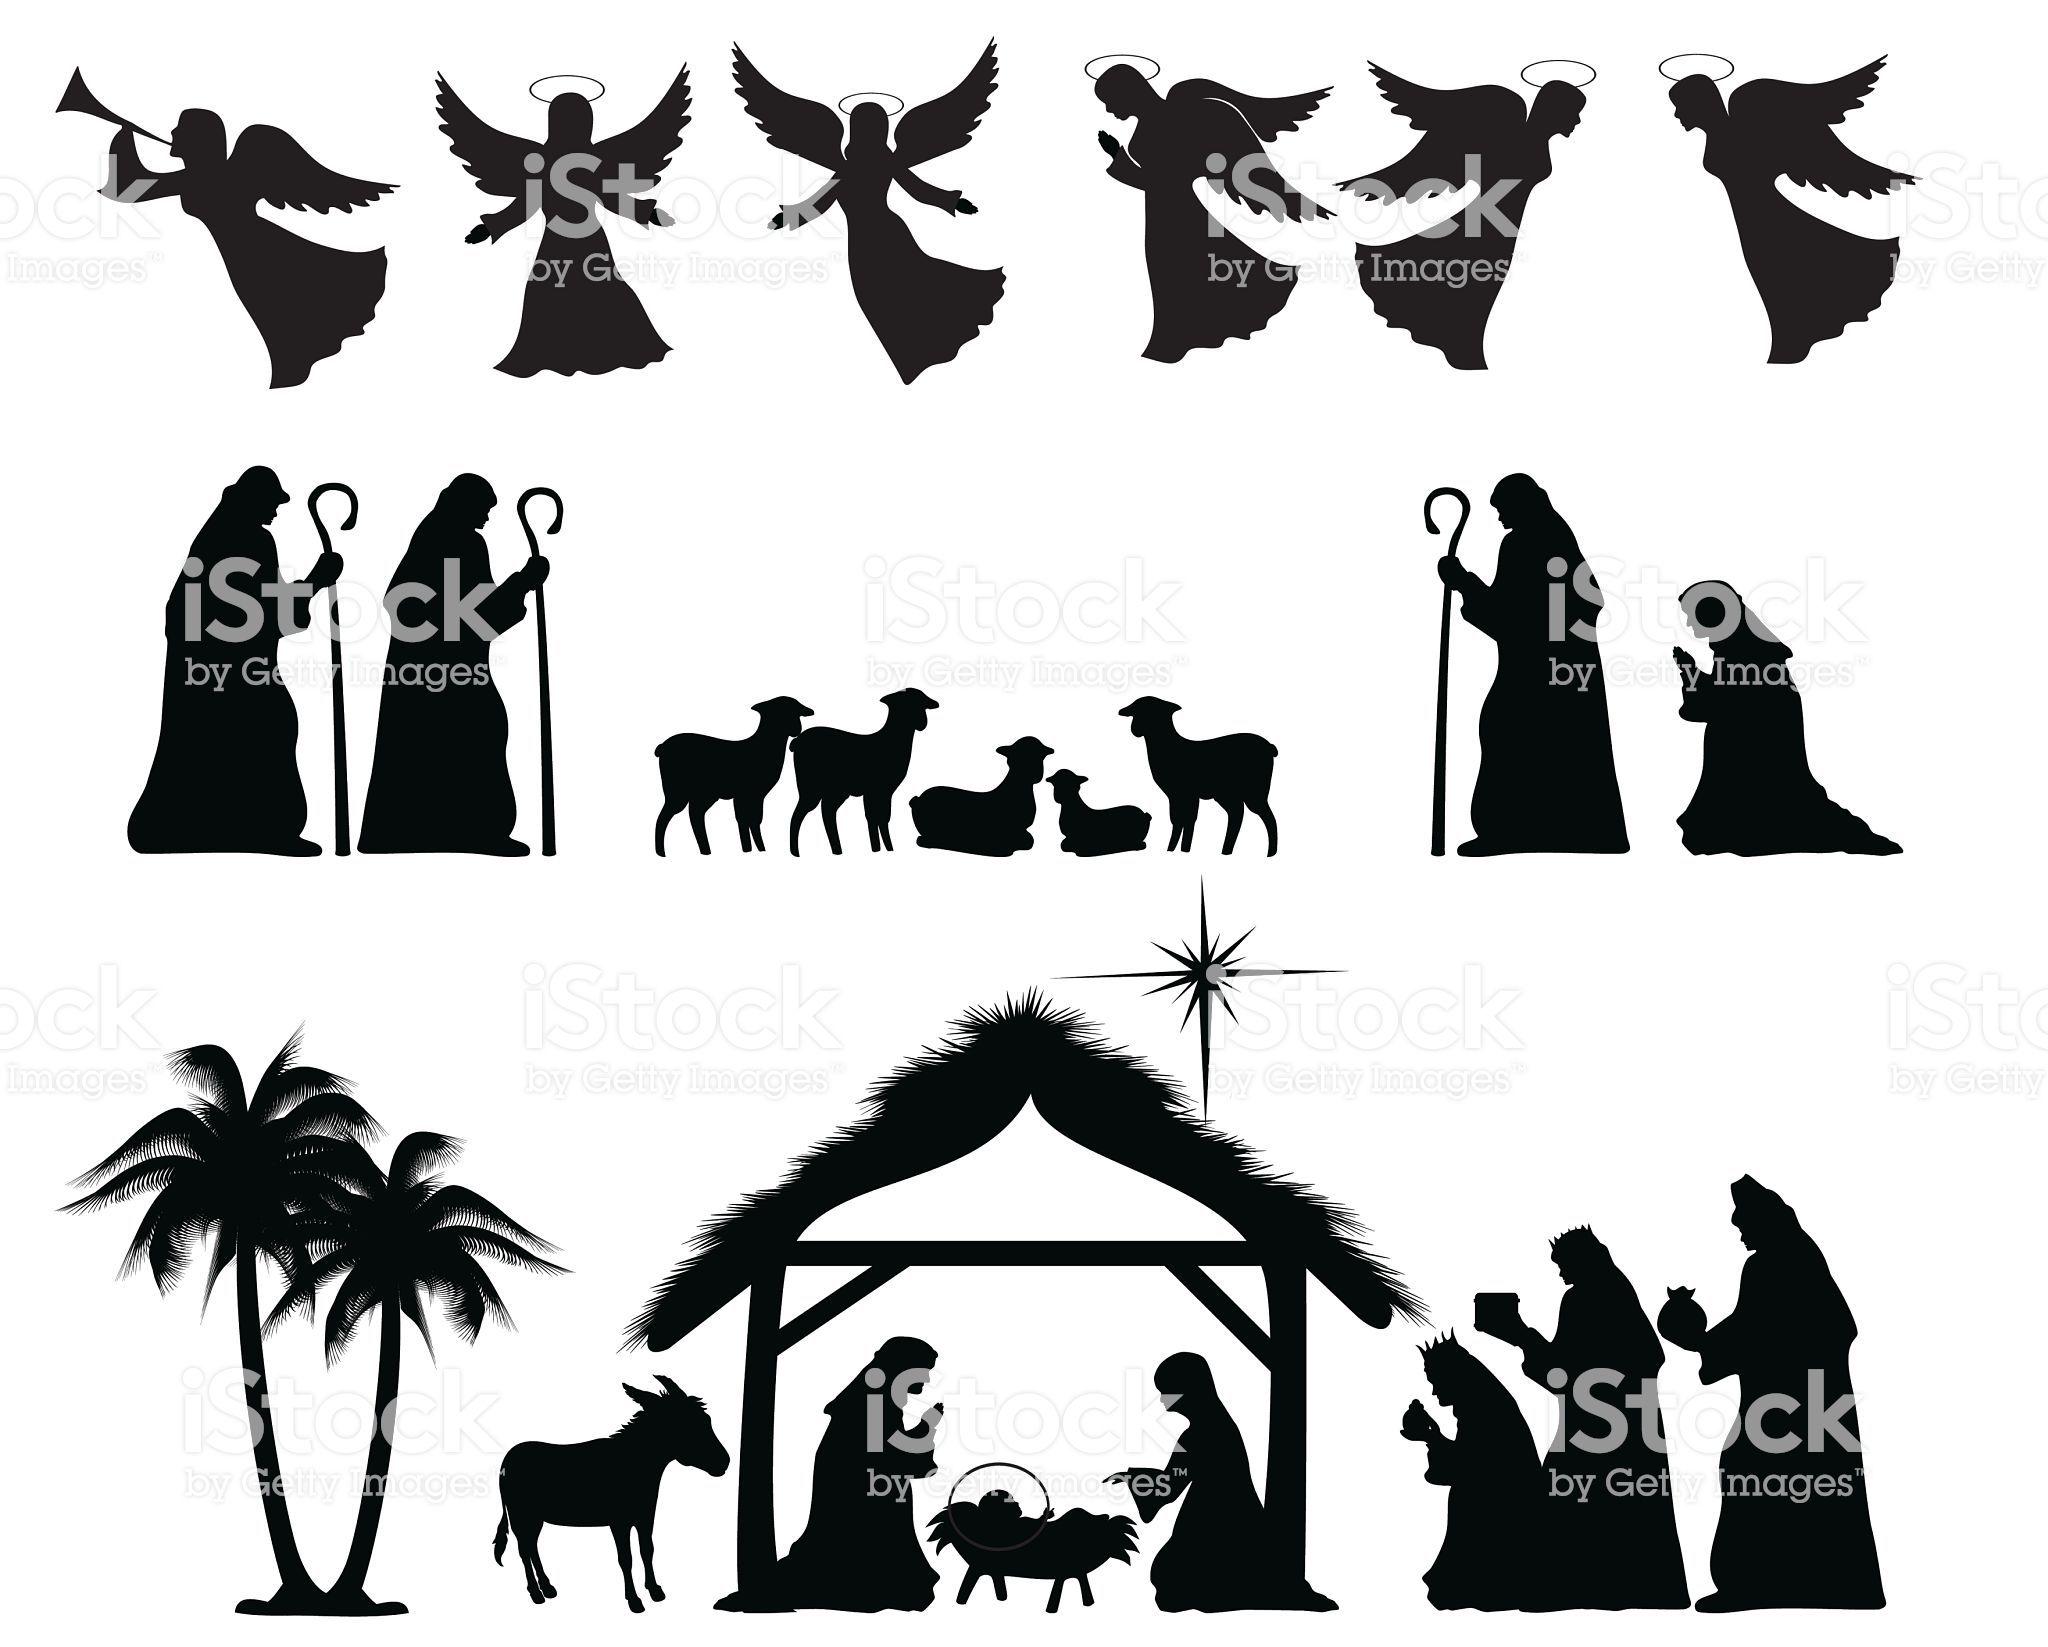 Christmas Nativity Silhouette. ZIP contains AI format, PDF